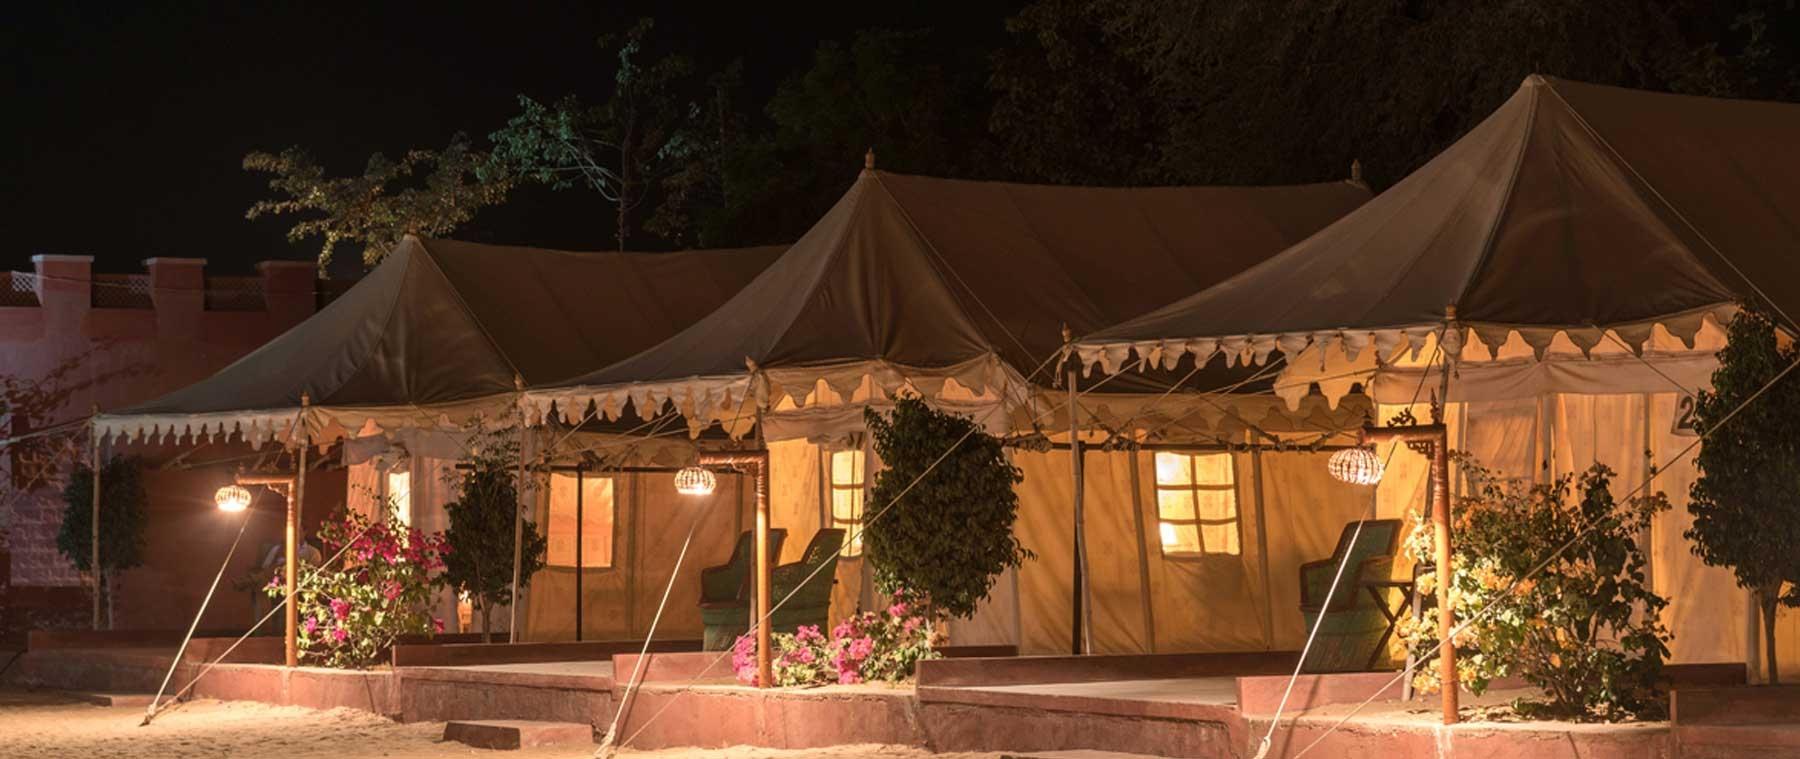 Osian Resorts and Camps (@osianresortcamp) Cover Image